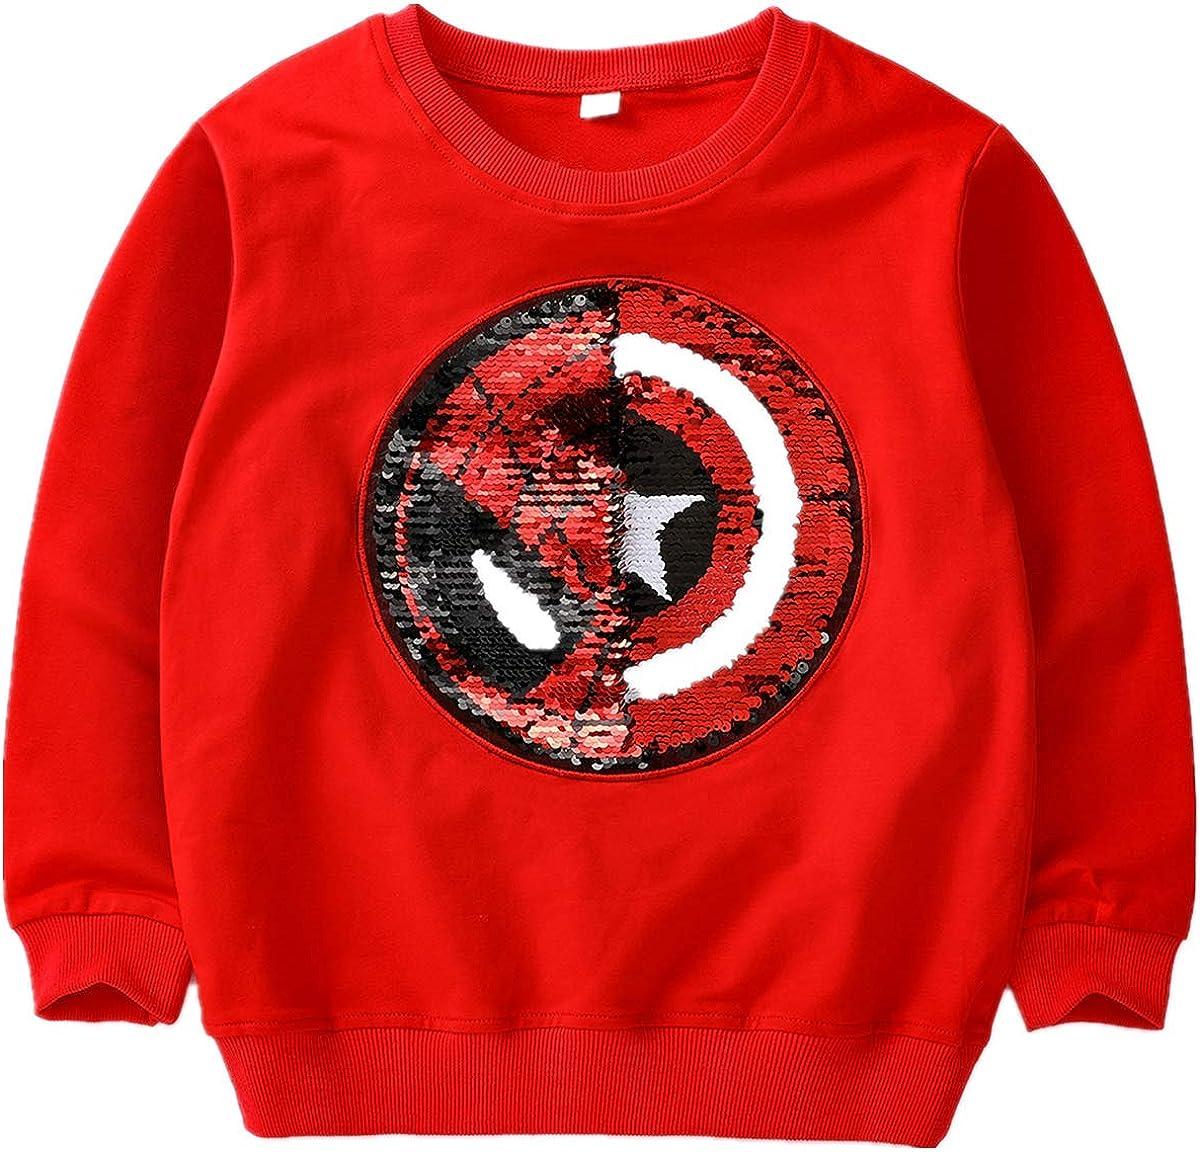 i pass Boys Girls Kids Superhero Flip Sequins Color Fashion Long Sleeve Sweatshirt Cotton 3-8 Years Old